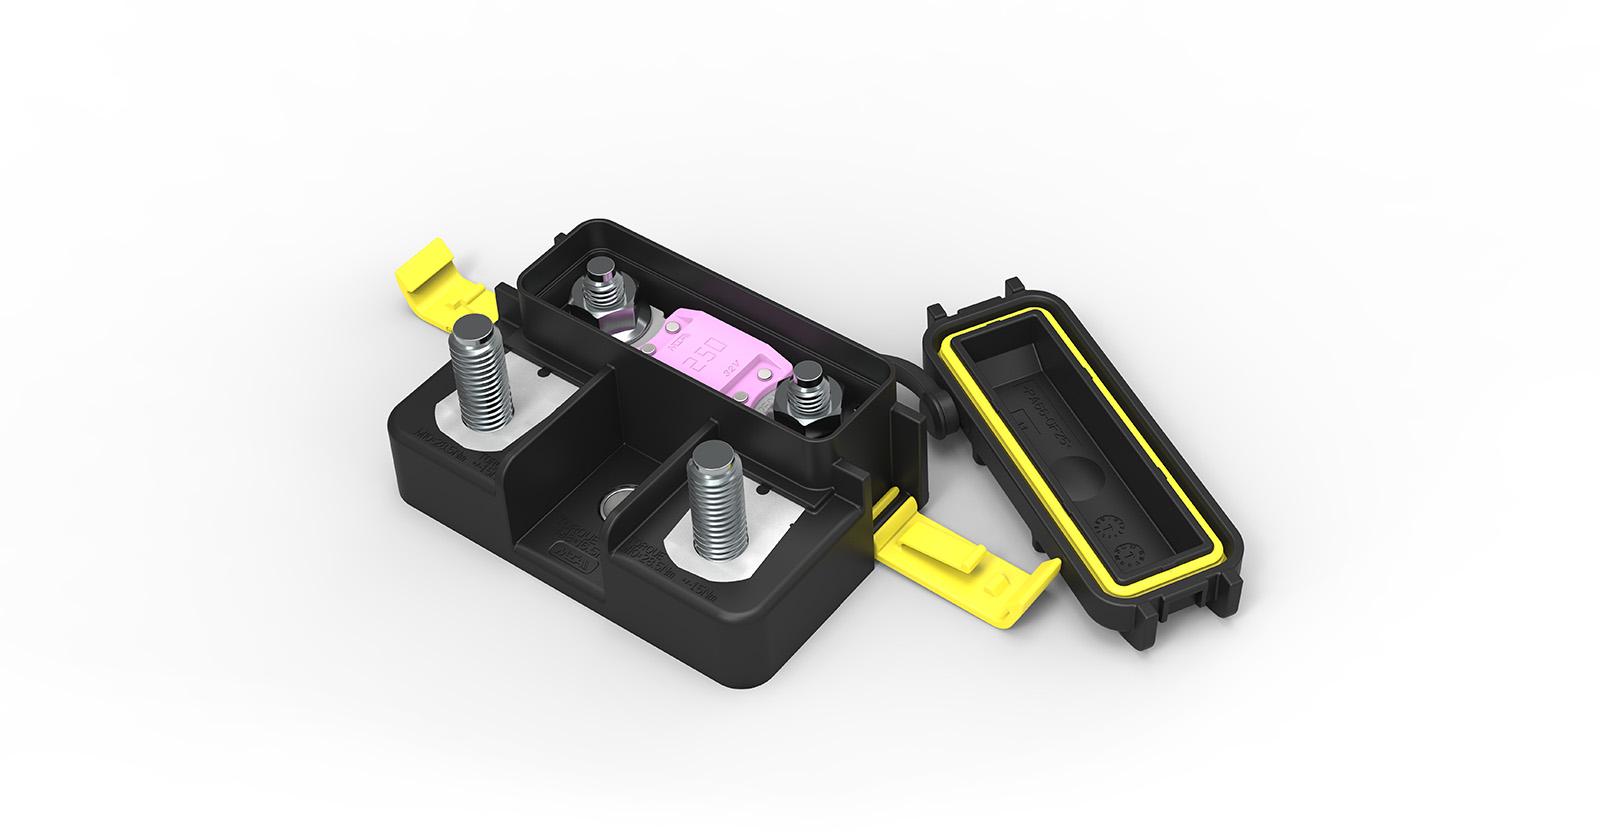 Waterproof 1-way MegaVal holder